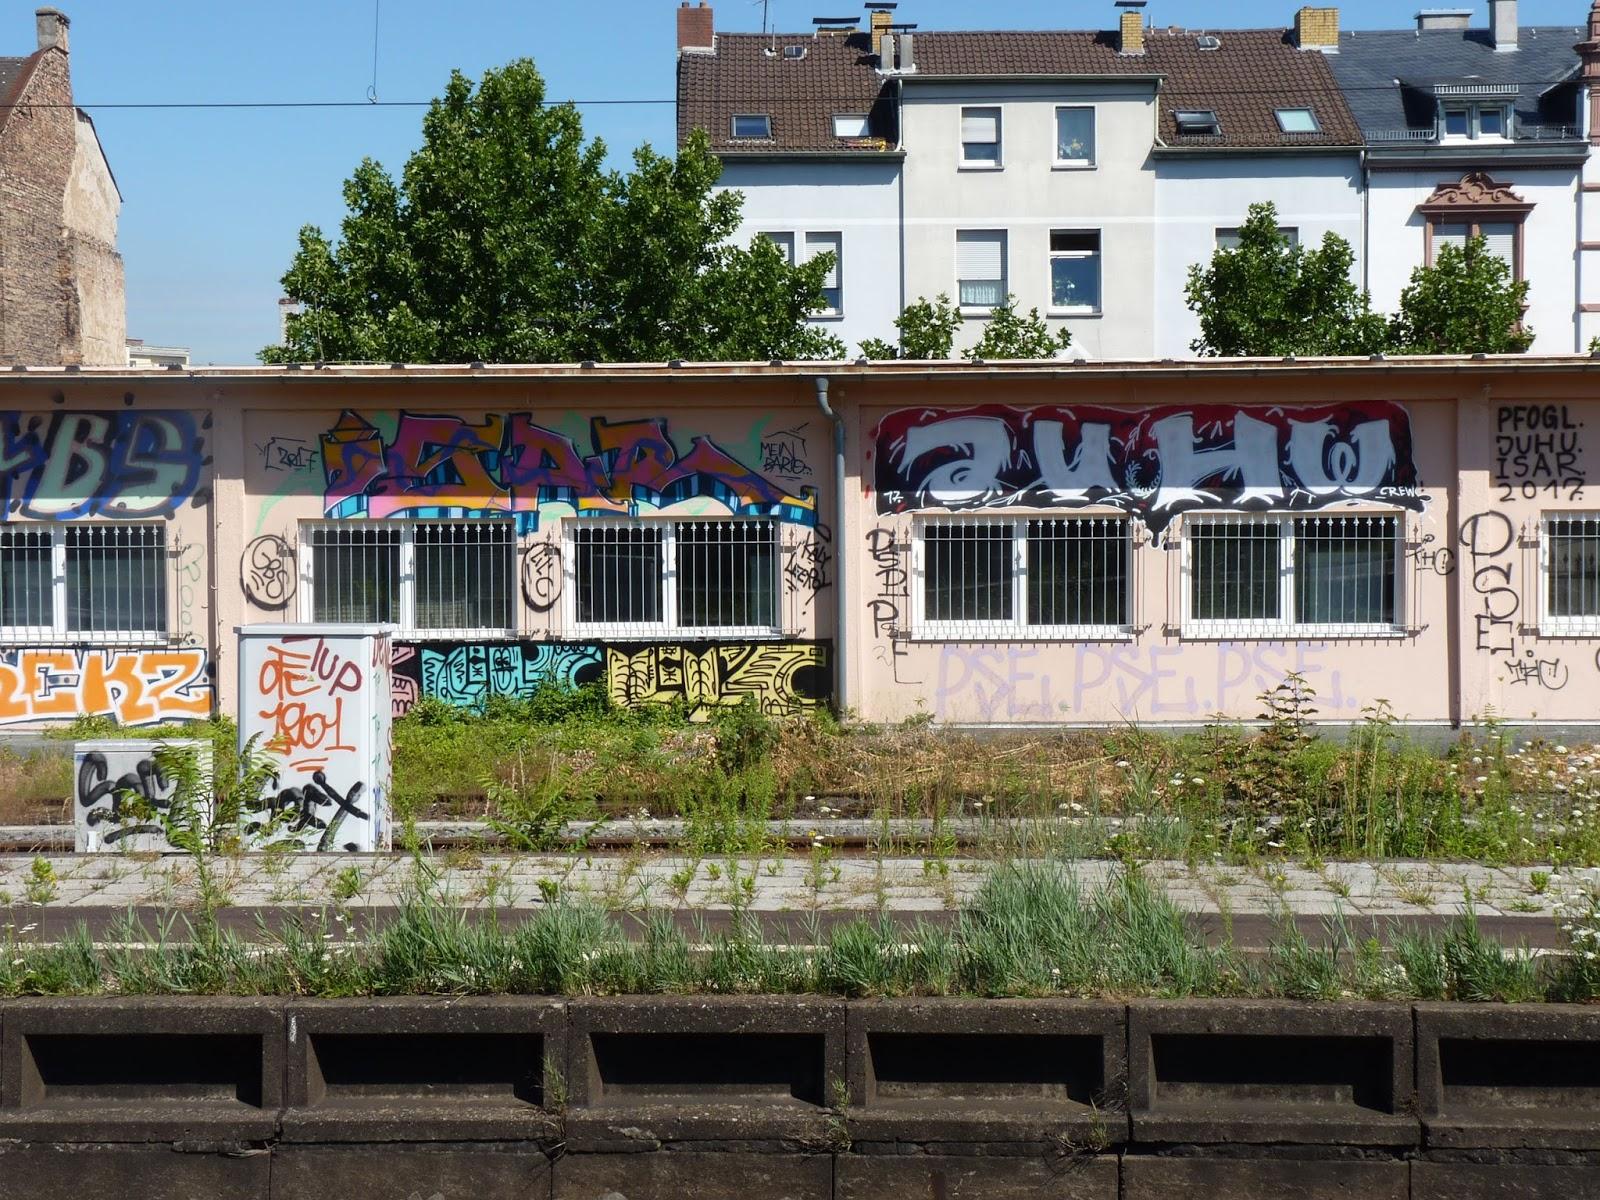 Die kollektive offensive graffiti street art anderer kram for Offenbach fh